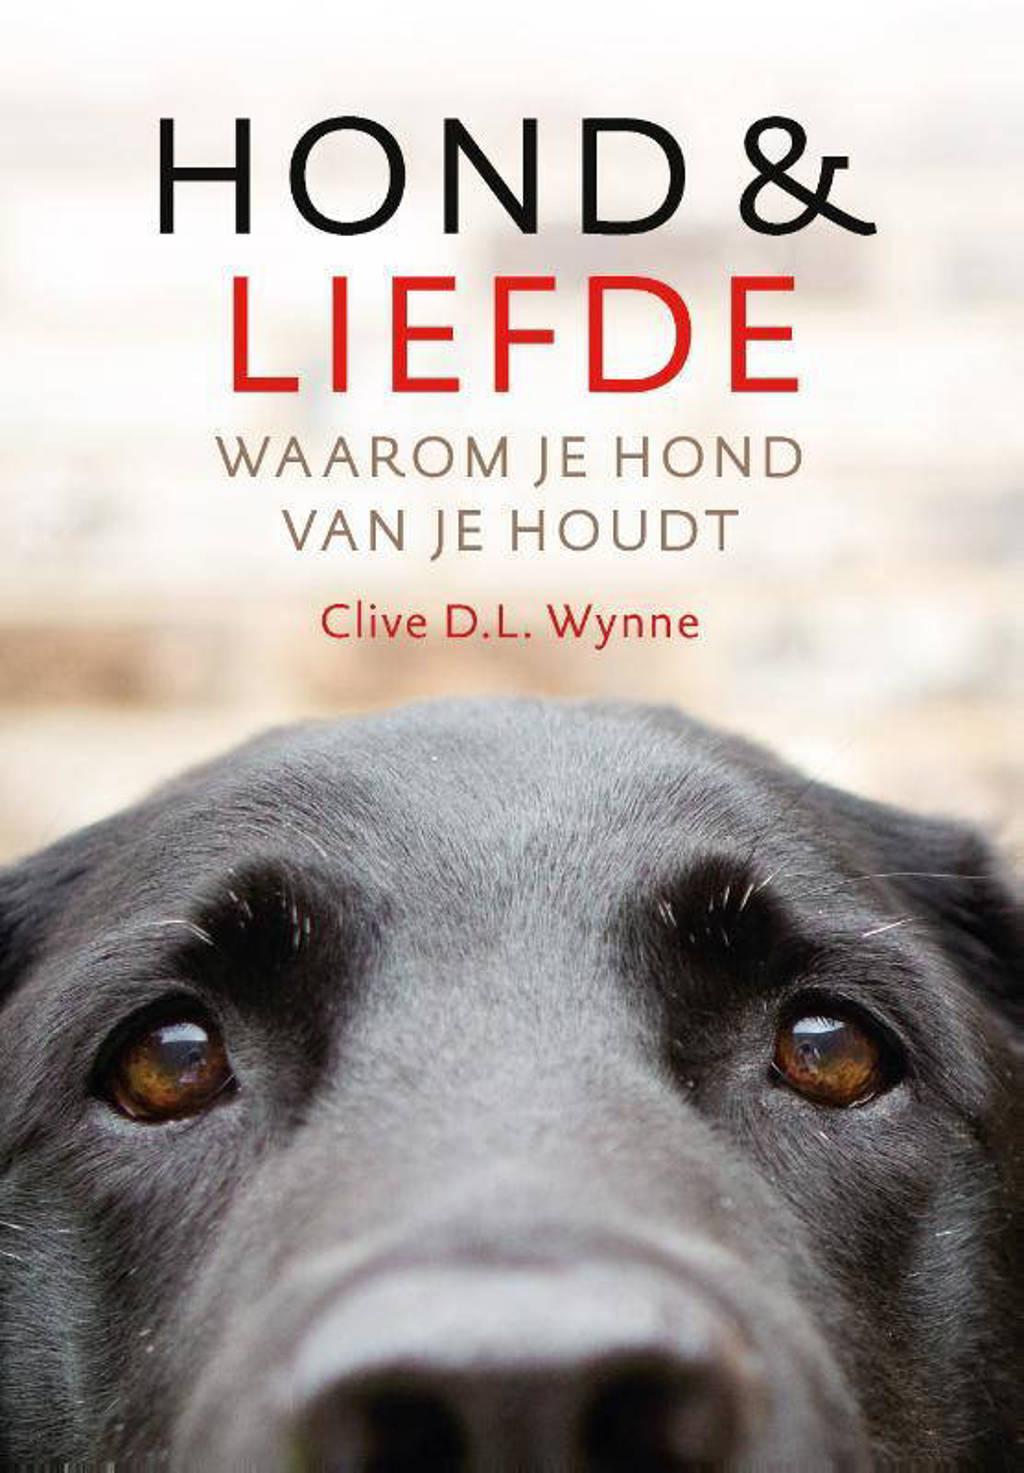 Hond & liefde - Clive D.L. Wynne